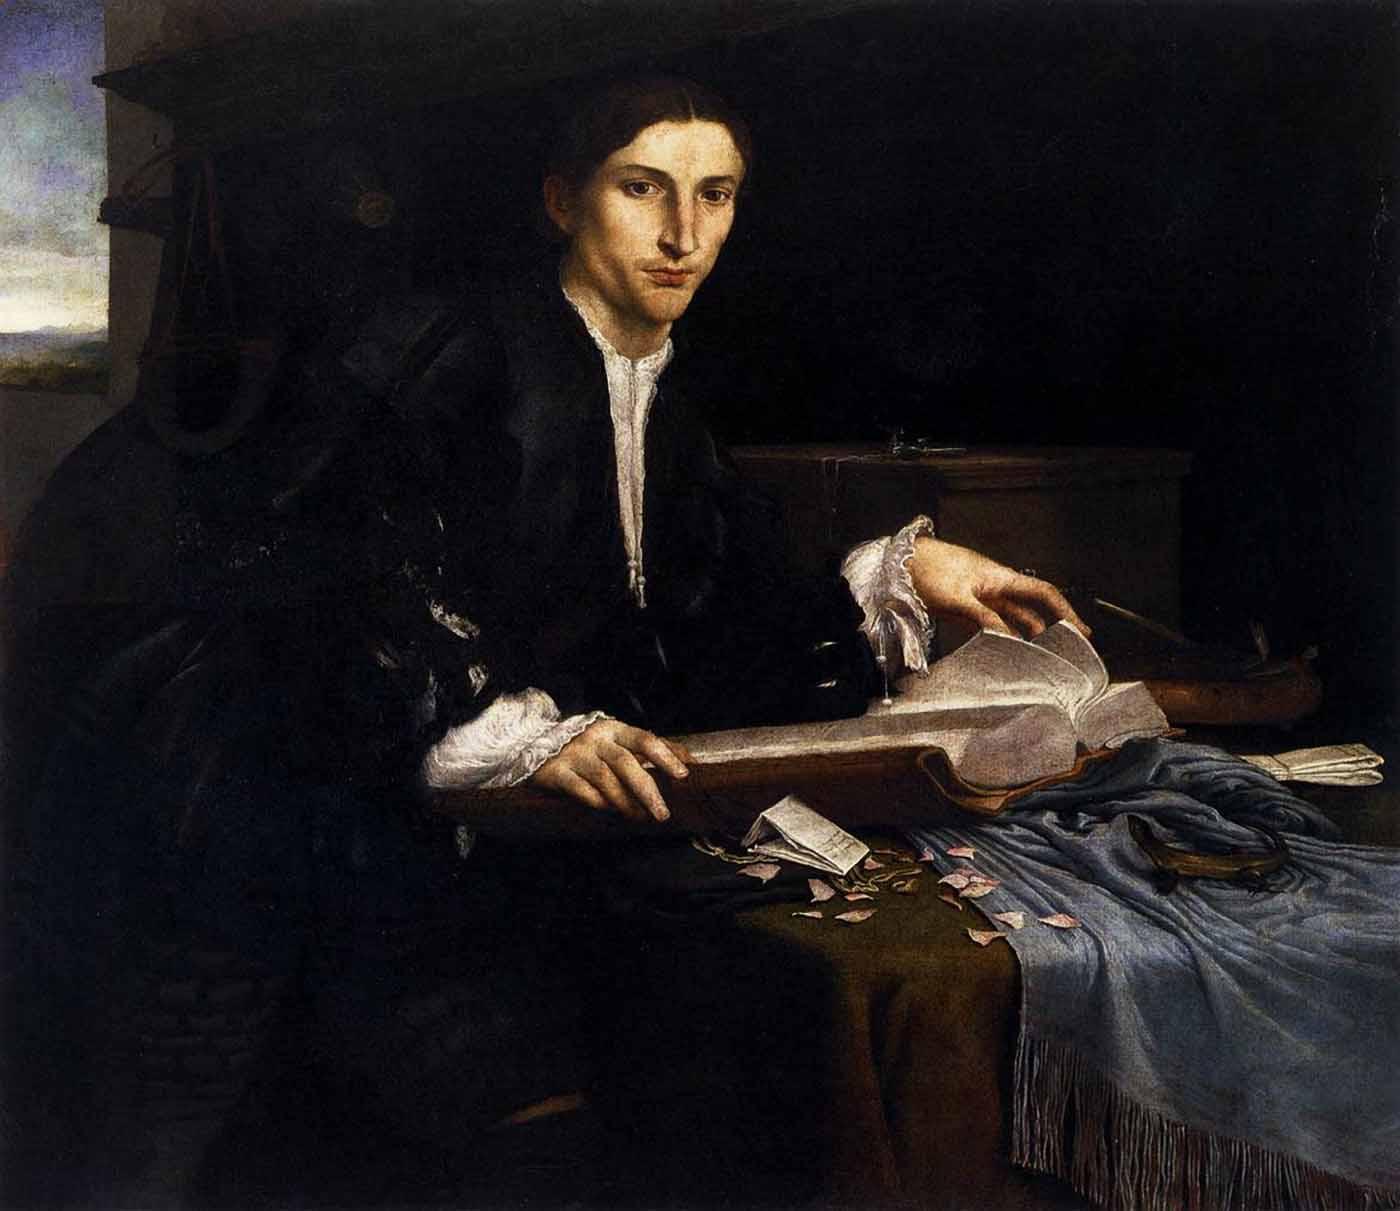 Лоренцо Лотто Портрет молодого ученого